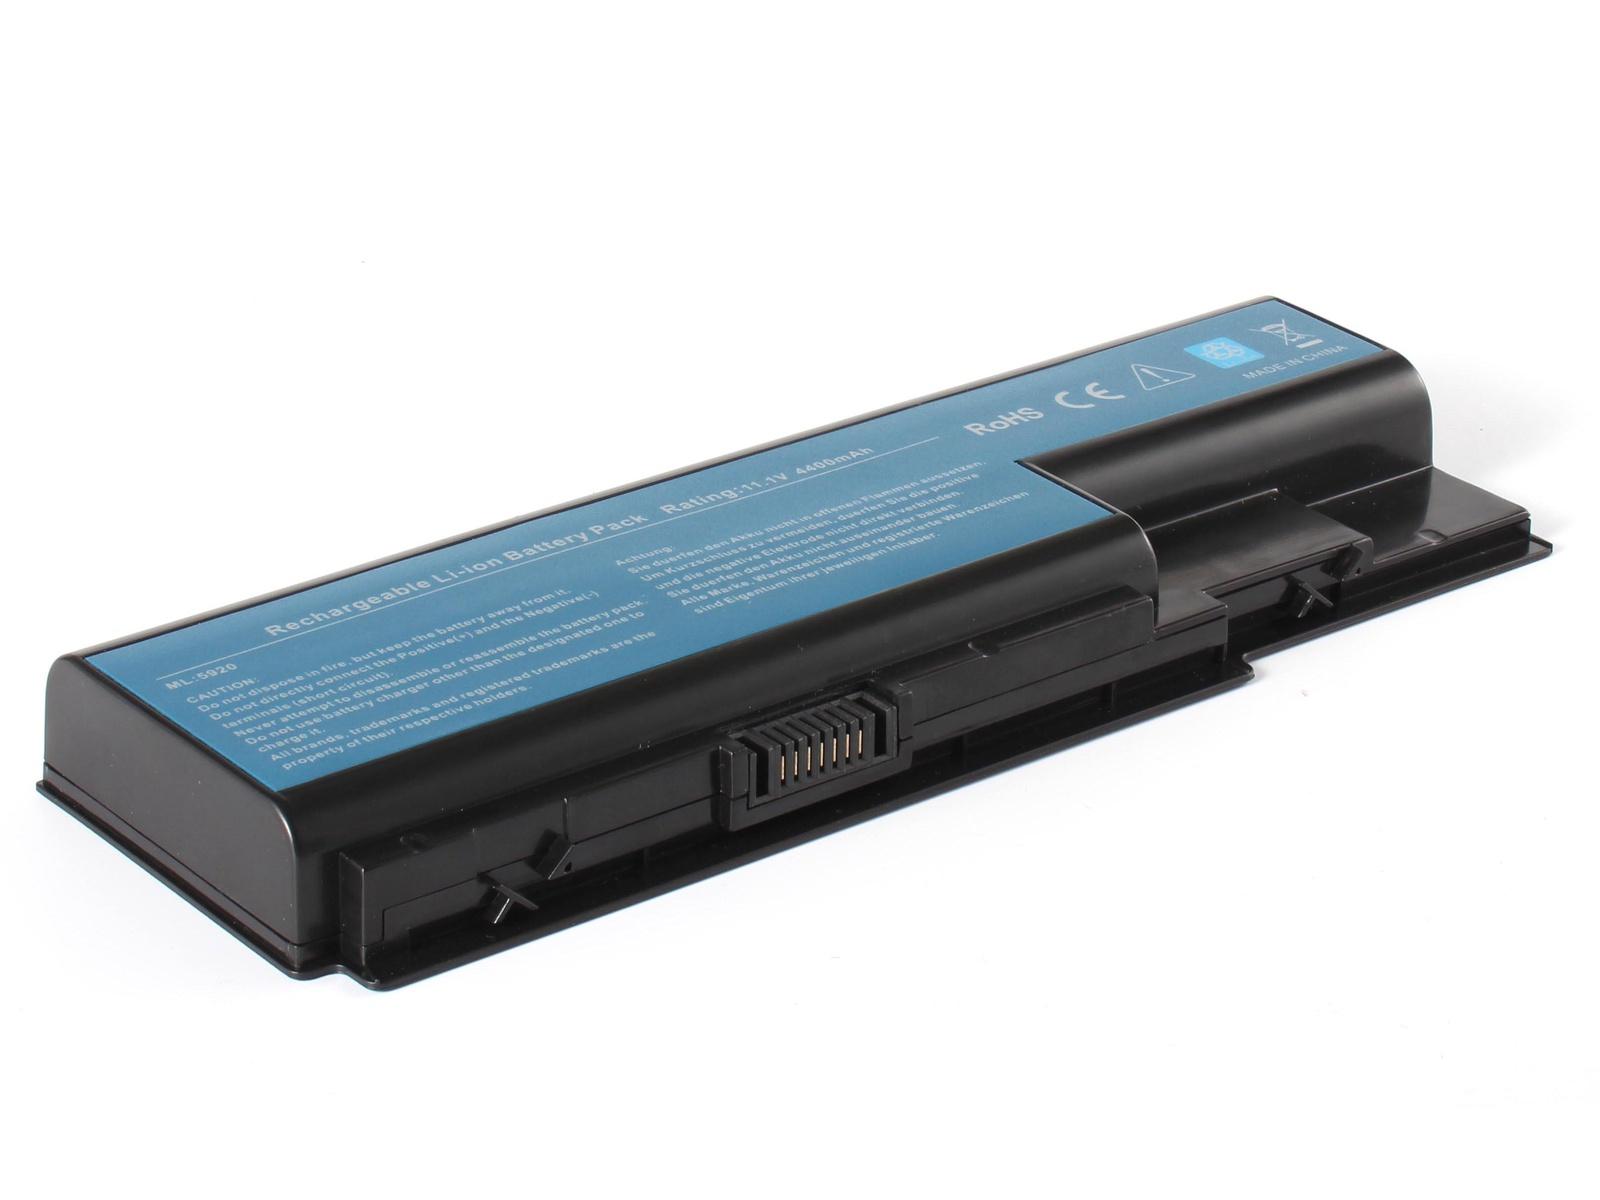 Аккумулятор для ноутбука AnyBatt для Acer Extensa 7630G-652G25Mi, Aspire 5942G-334G50Mi, Aspire 6920G-6A4G25MN, Aspire 6930G-644G25Mx, Aspire 6930Z, Aspire 7520G-503G32Mi, Aspire 7540G-304G25Mi, Aspire 7738G-874G50Mi 8cell 14 8v as07b31 original laptop battery for acer aspire as07b32 5520 5720 5920g 5930g 6920g 6930g 7520g 7330 5930g as07b51